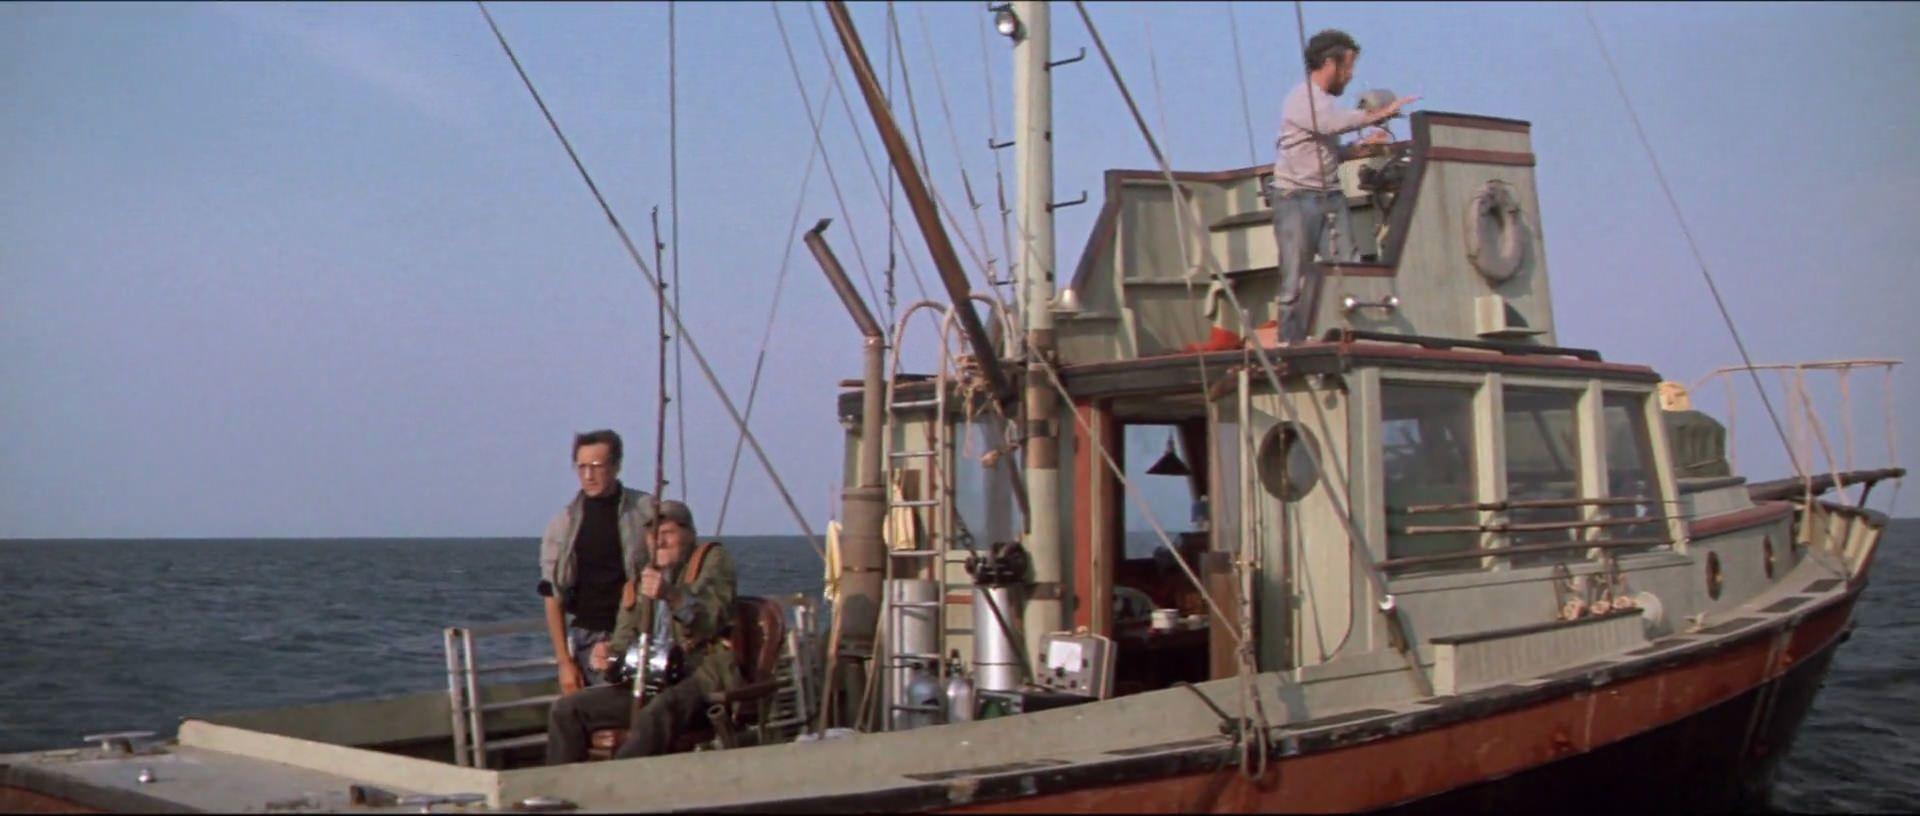 jaws 1975 movie screencapscom steven spielberg